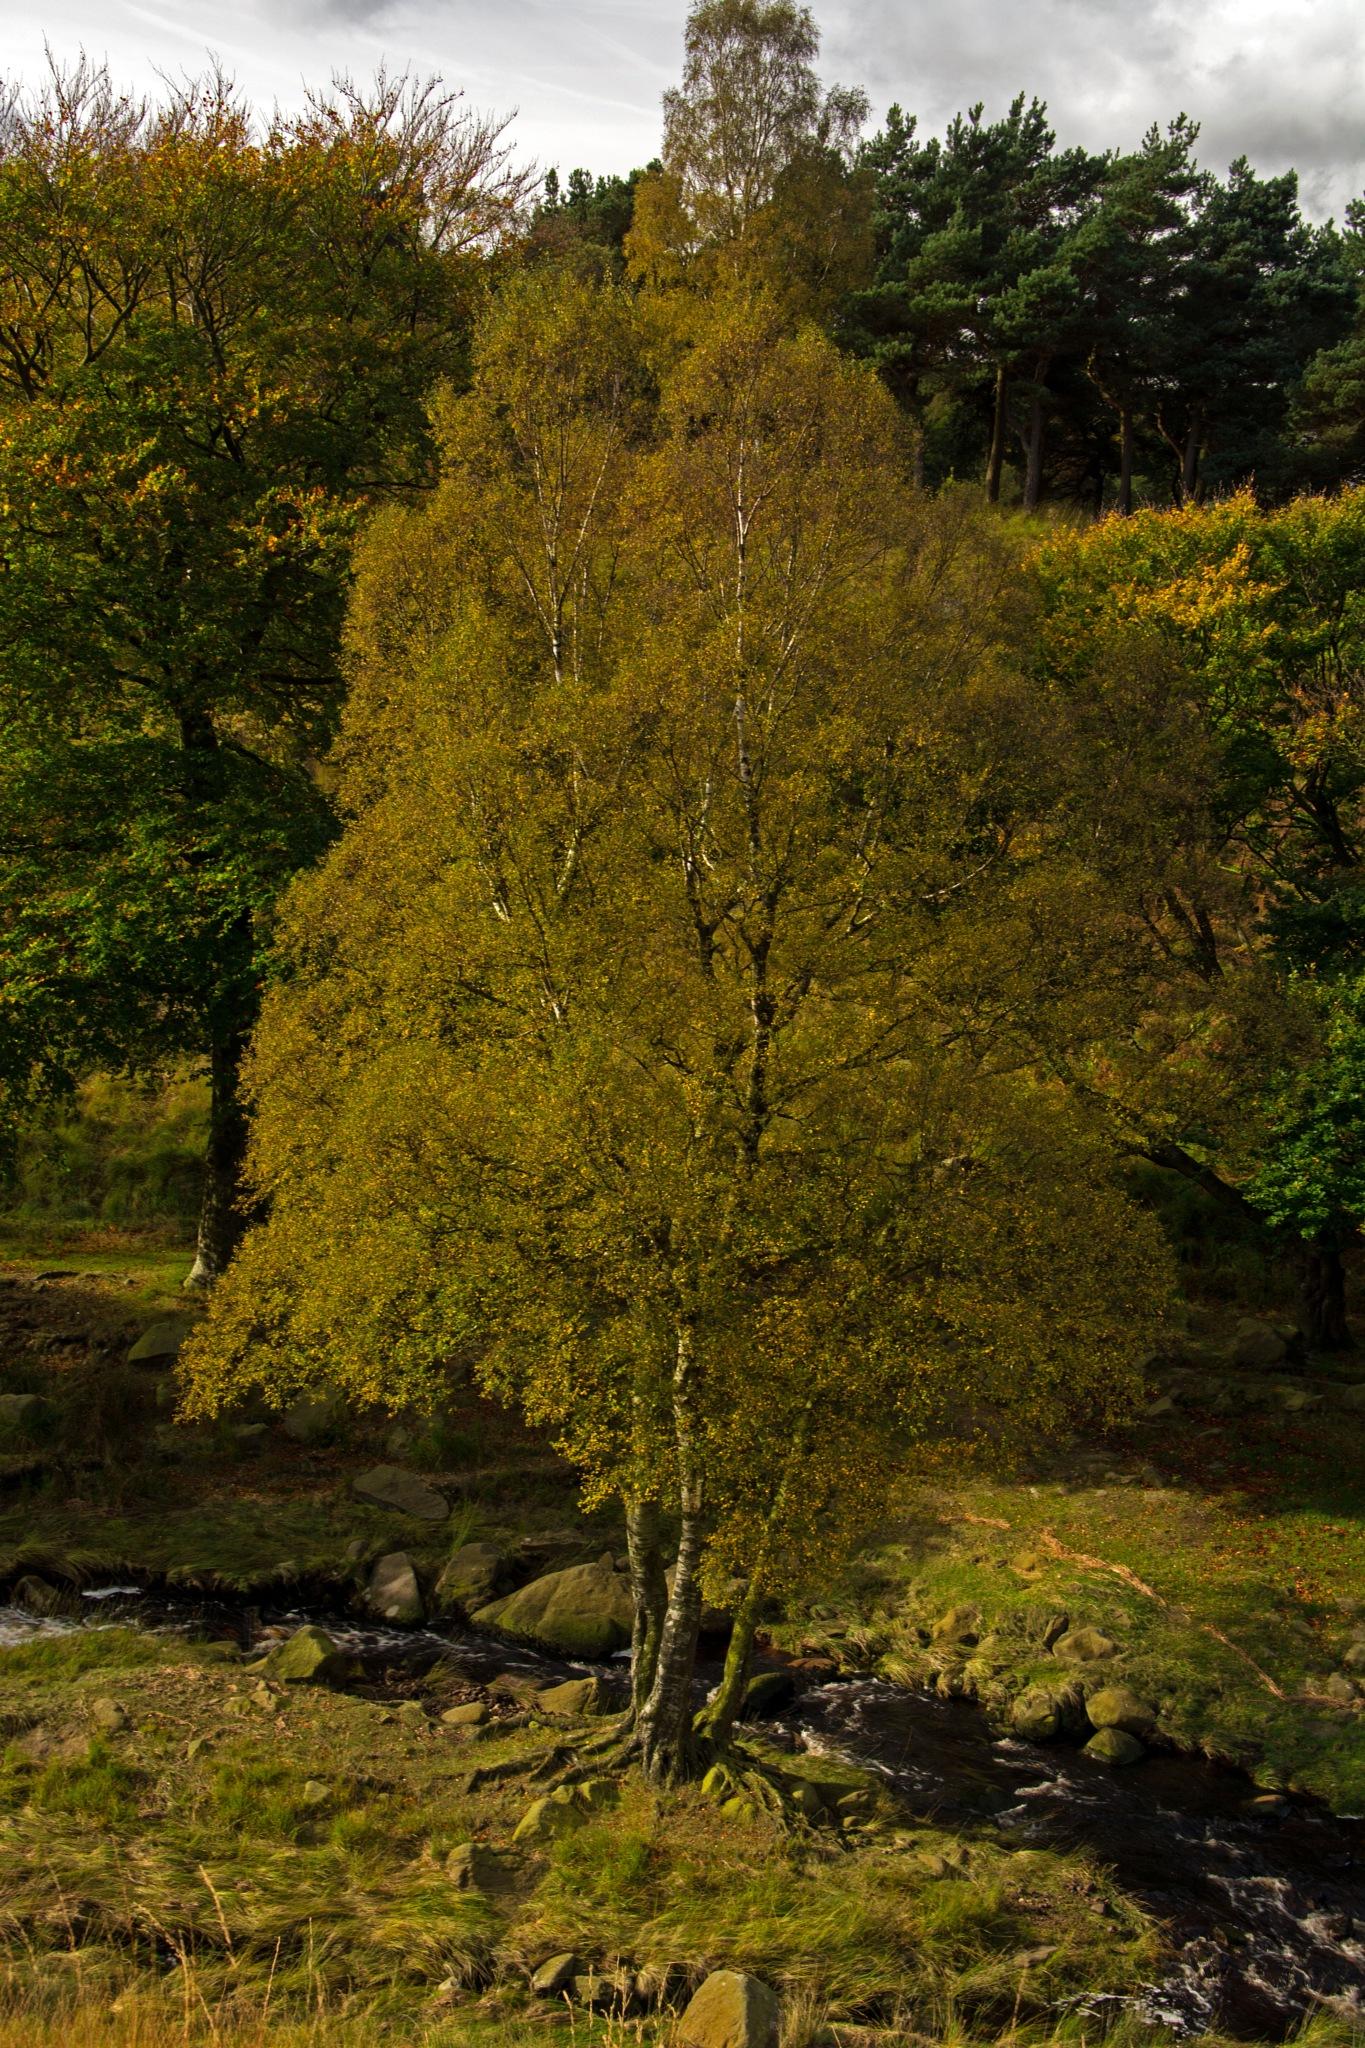 Autumn tree by ianjck